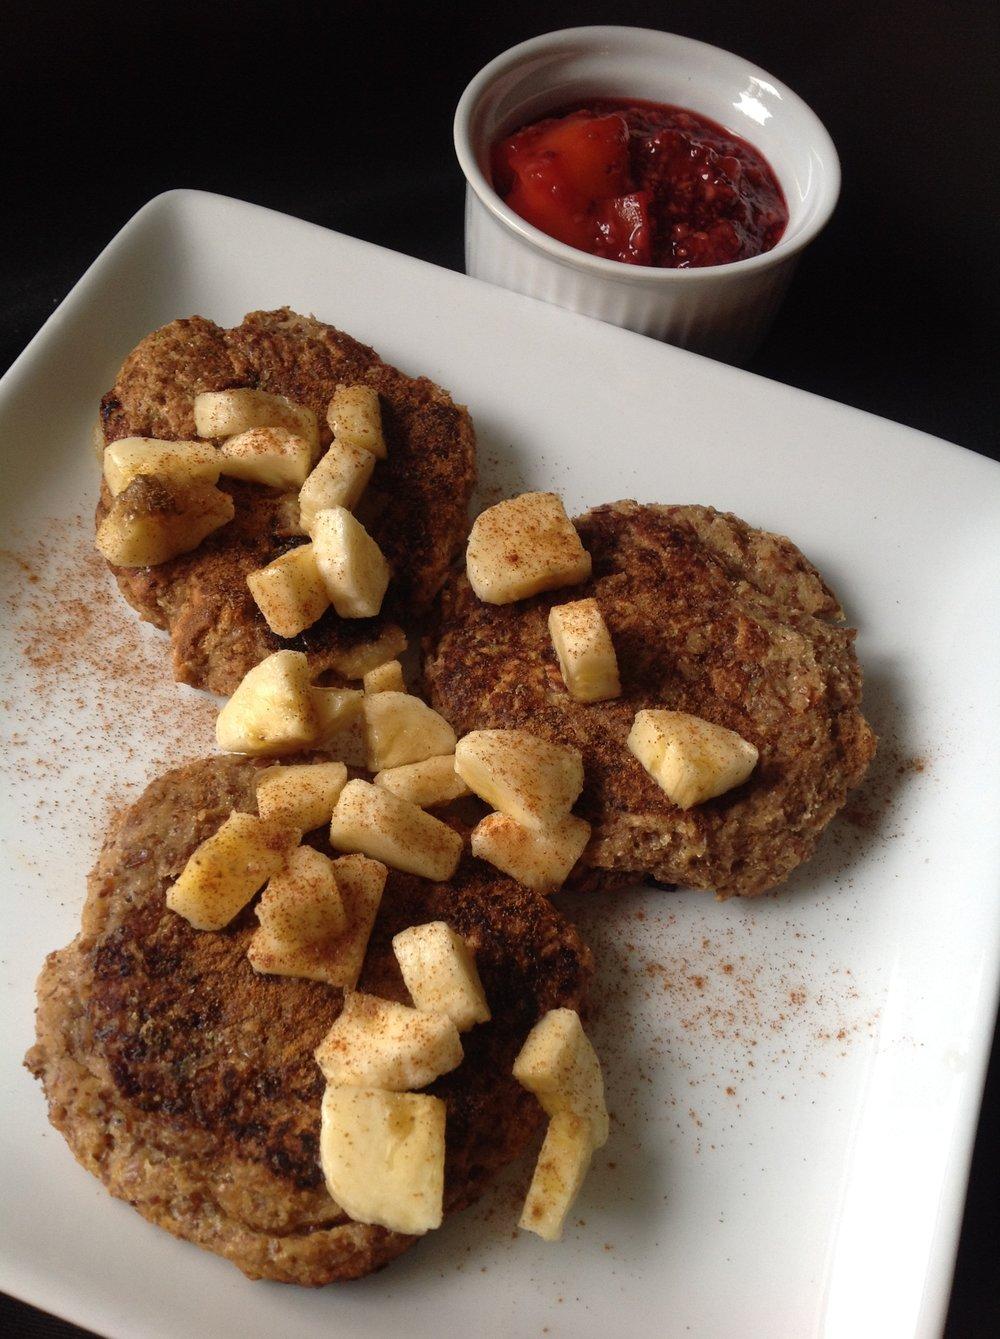 Coconut Pancakes with Raspberry Mango Chia Jam - Healthy, Gluten-Free, Grain-Free, Plan-Based, Vegan Breakfast Brunch Recipe